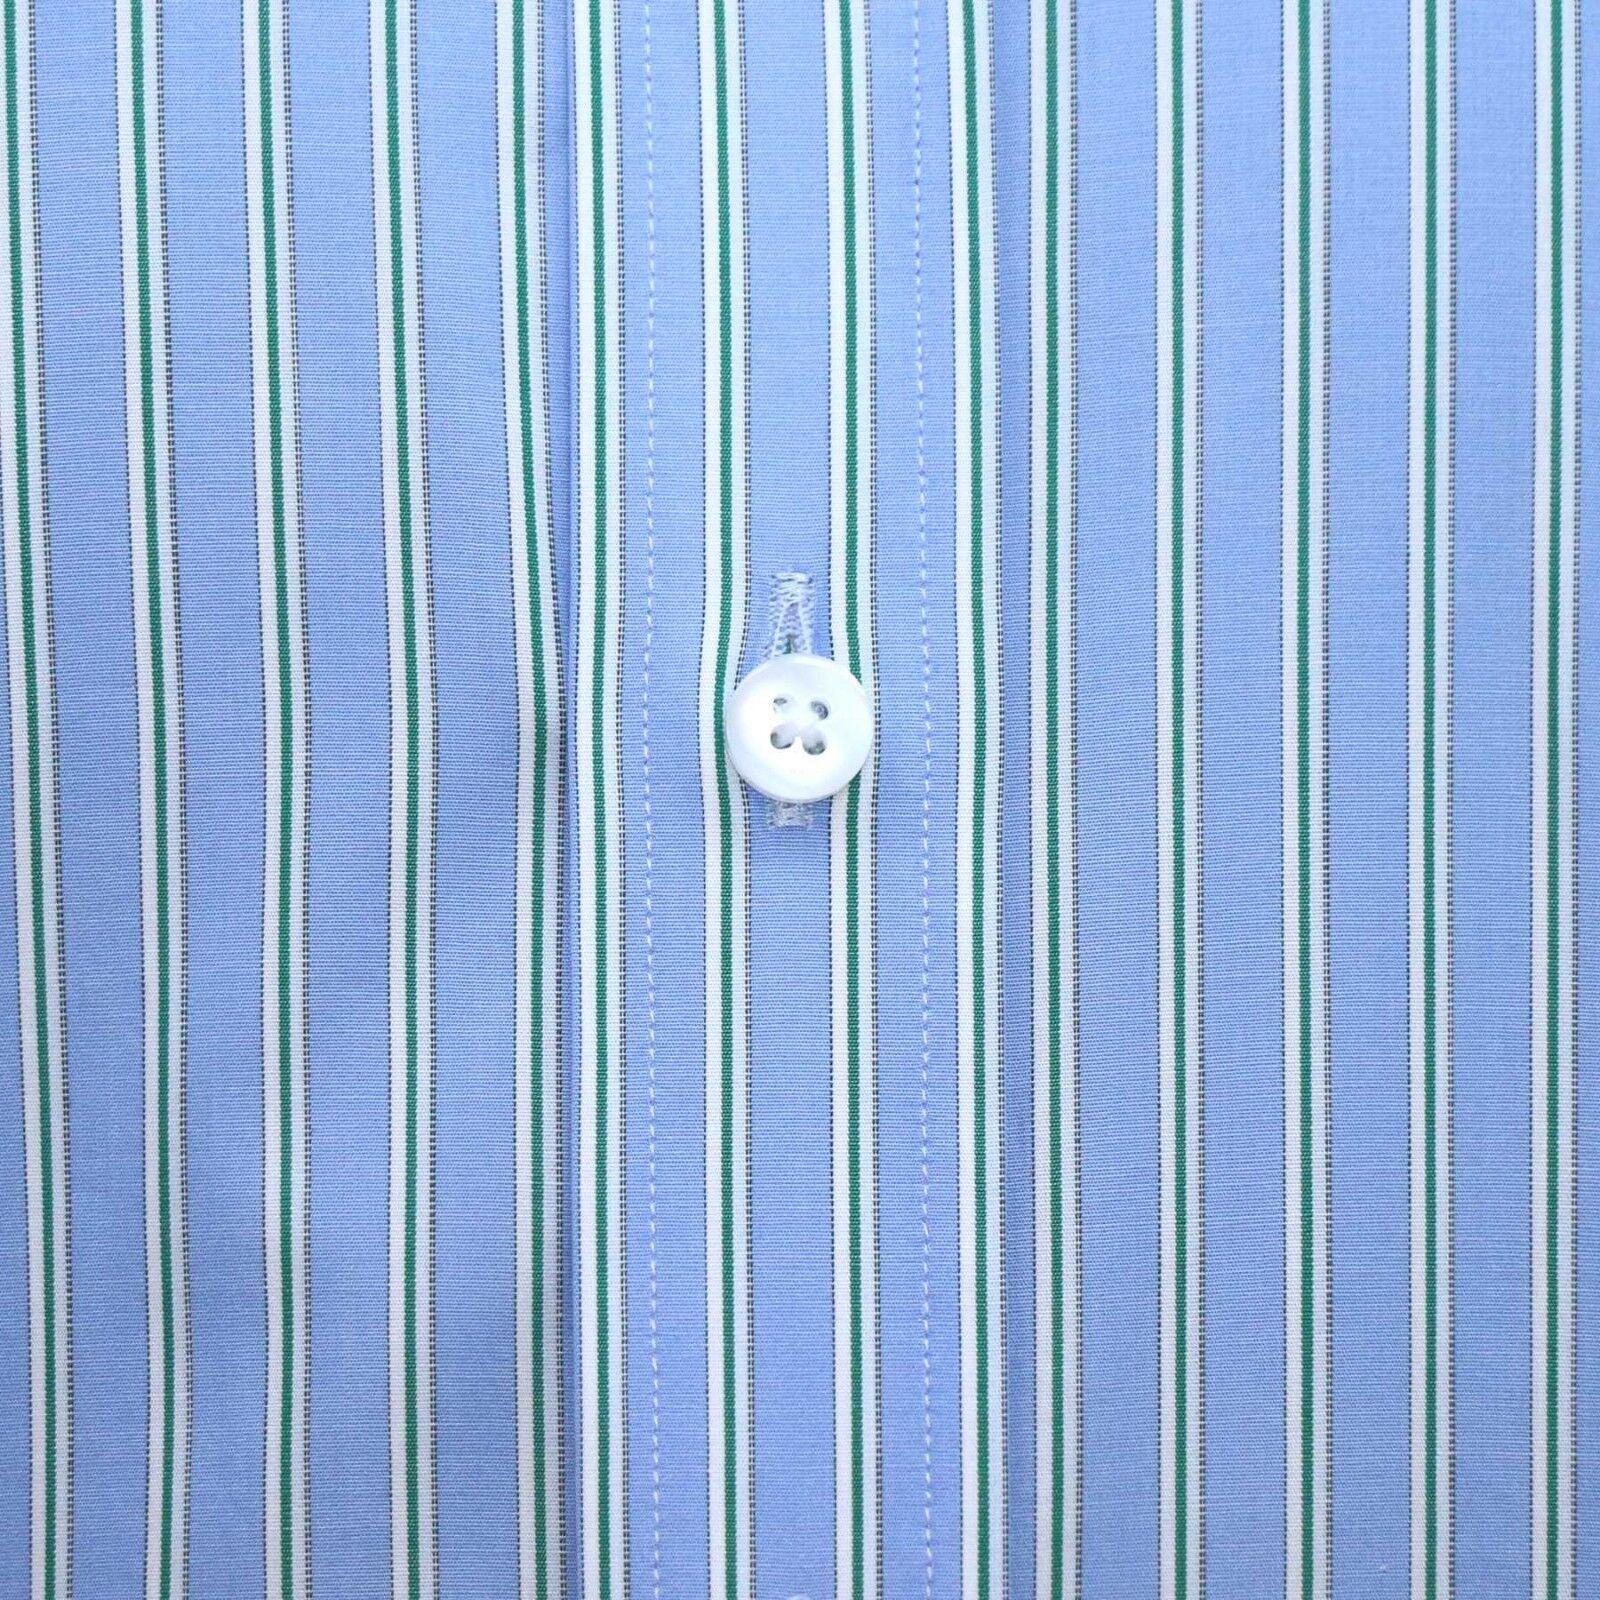 PENNY Da Uomo Colletto della Camicia Pallido Blinder Blinder Blinder Lite Blu a Strisce Verdi Grandad ROUND Club 1b9f83